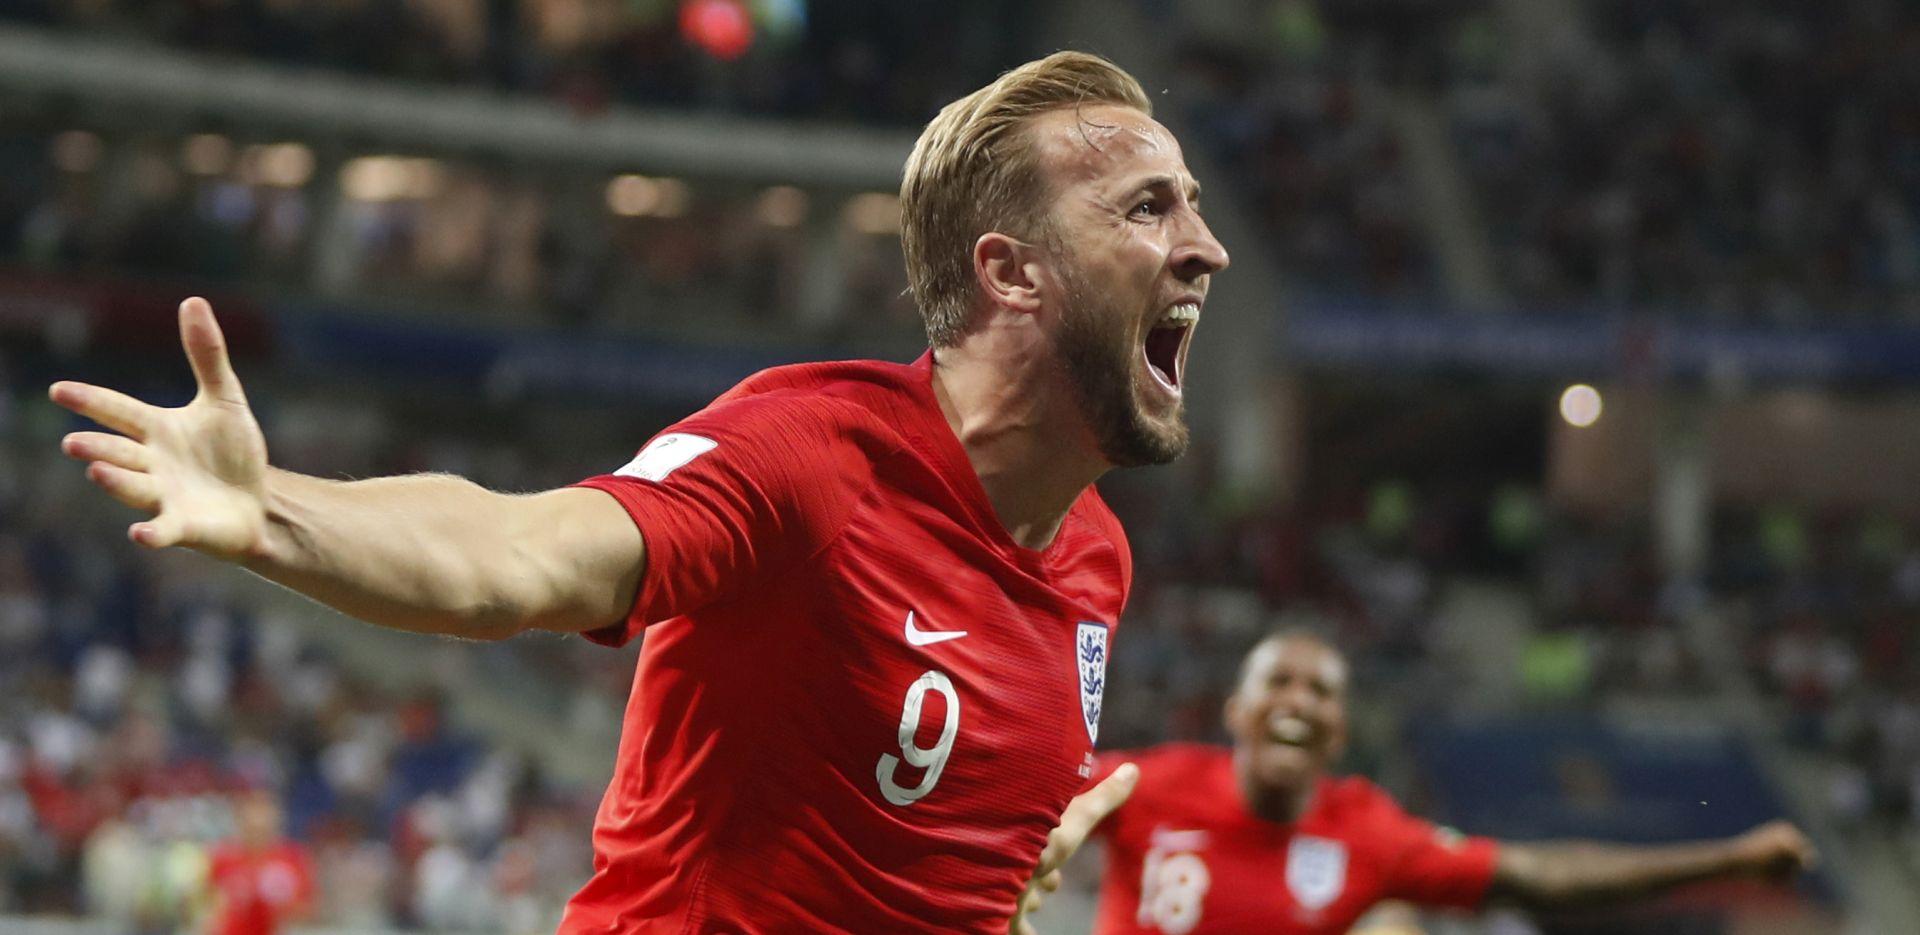 VIDEO: Engleska u finišu utakmice 'slomila' Tunis, dva gola Kanea